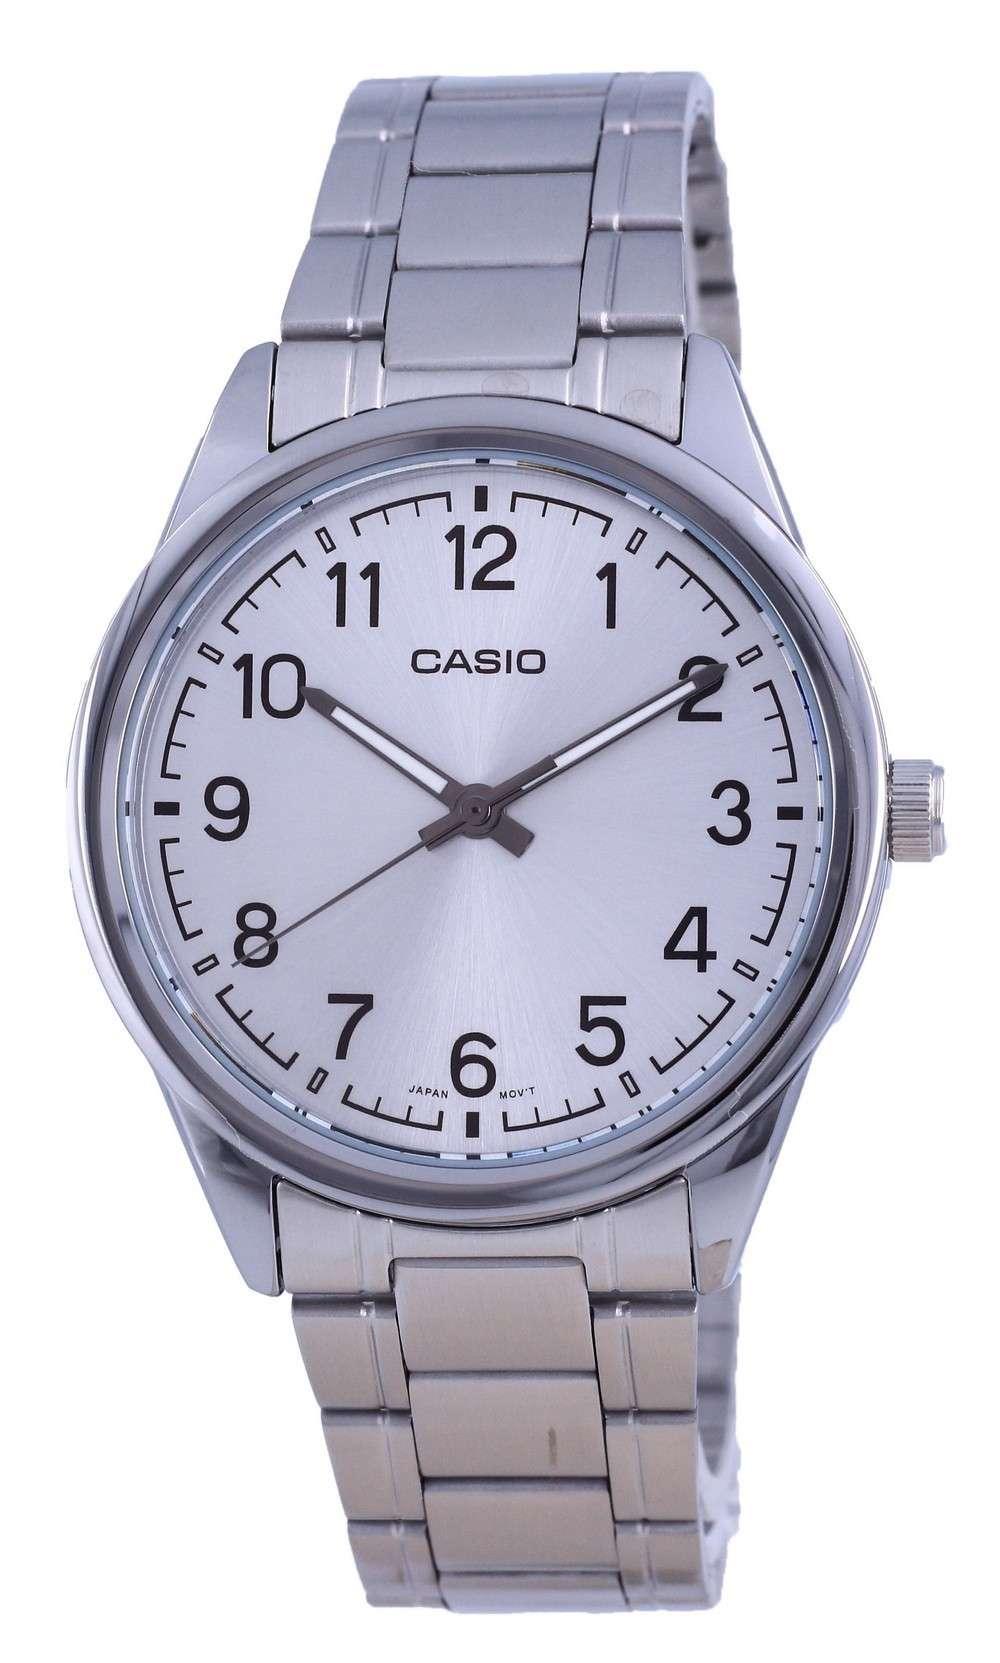 Reloj Casio de cuarzo analógico de acero inoxidable con esfera plateada MTP-V005D-7B4 MTPV005D-7 para hombre